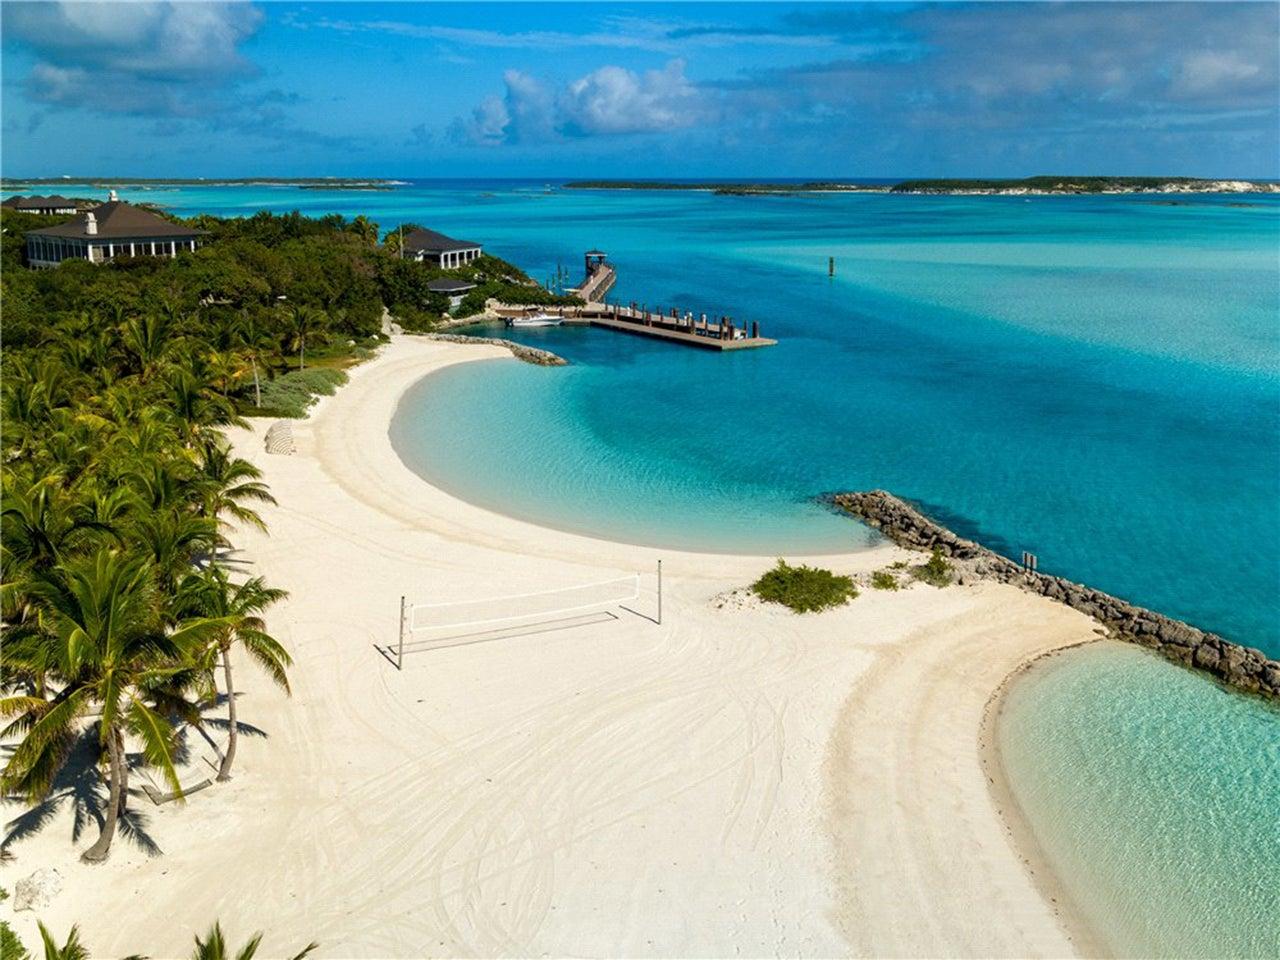 Virgin Atlantic launching flights to the Bahamas - The Points Guy UK